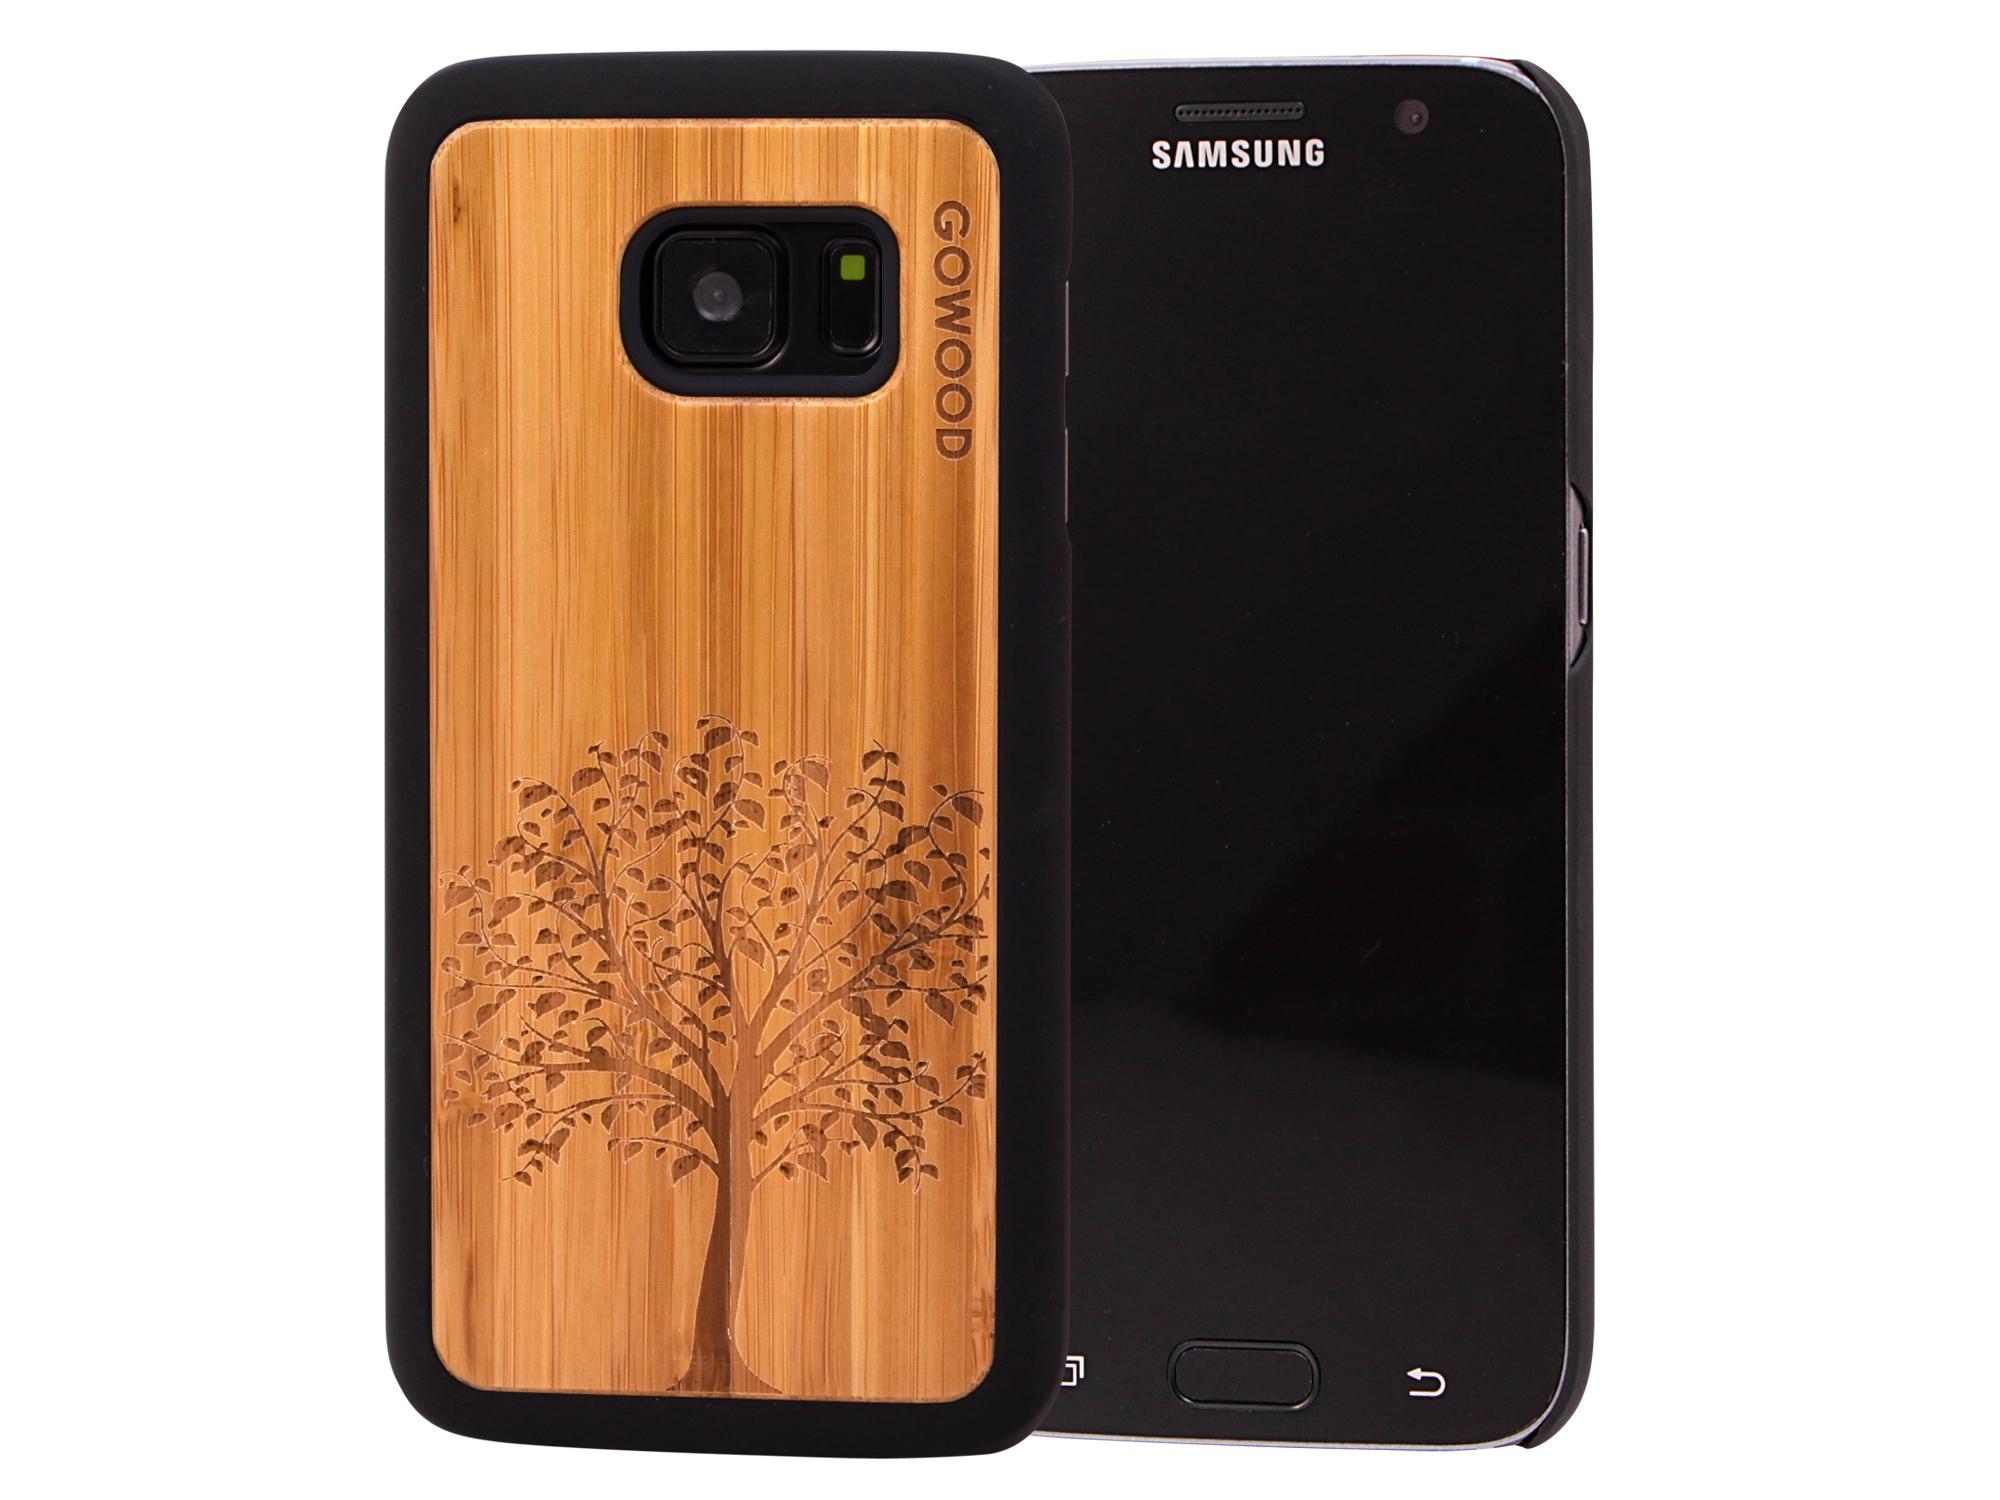 Samsung Galaxy S7 wood case